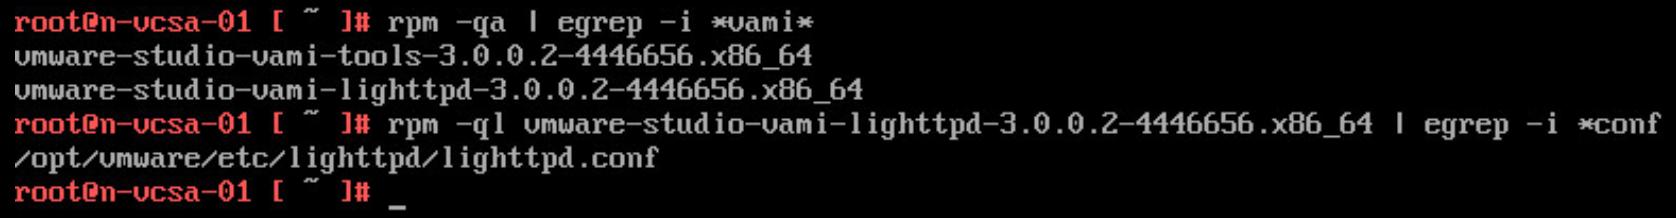 IPv6-Issue-06